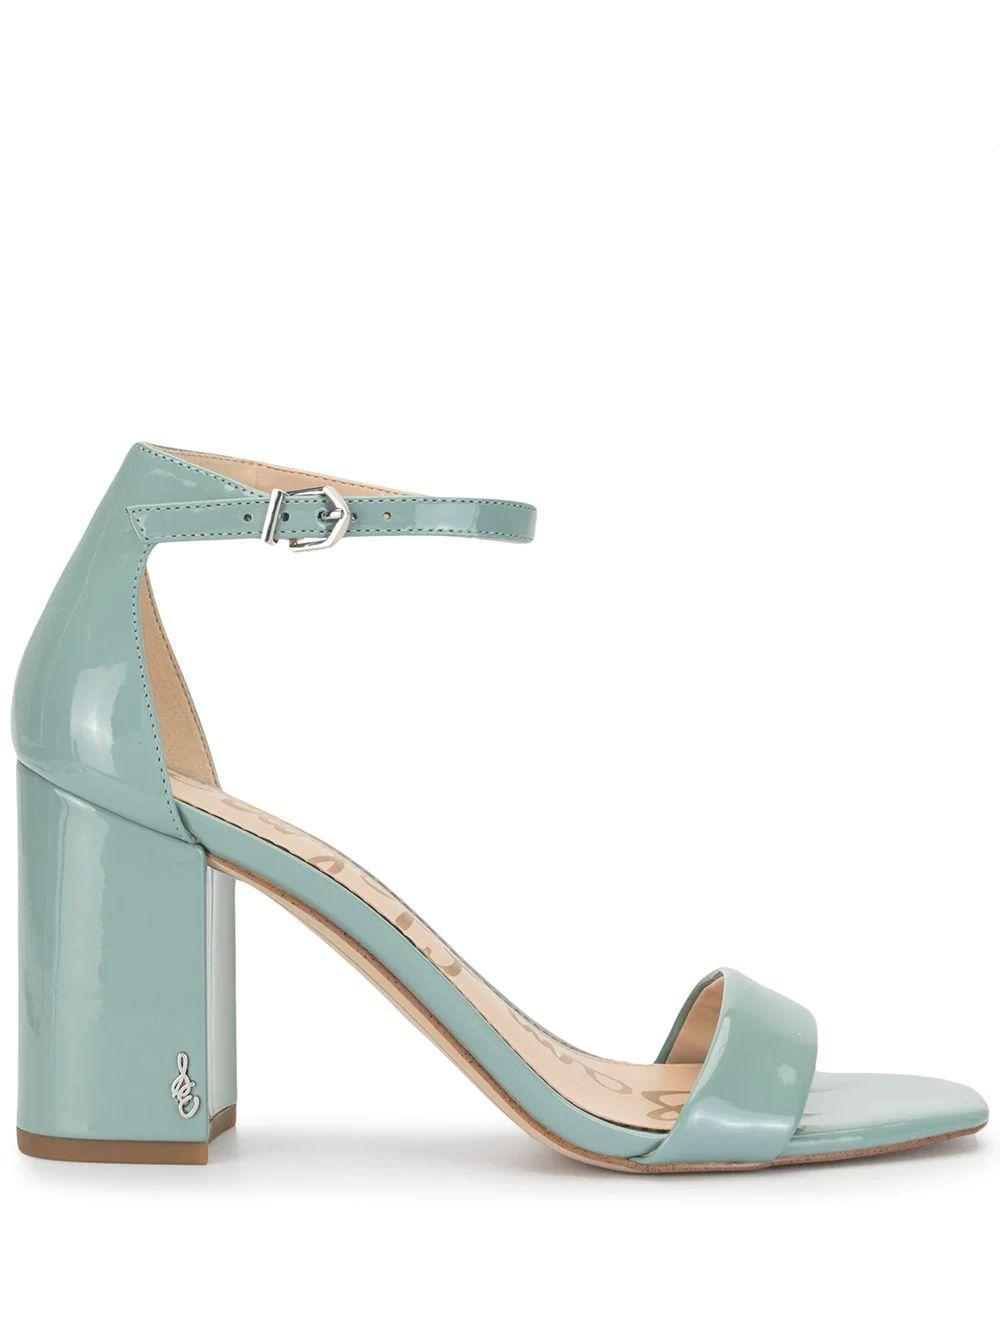 Daniella Patent Block Heel Sandal Item # DANIELLA-PAT